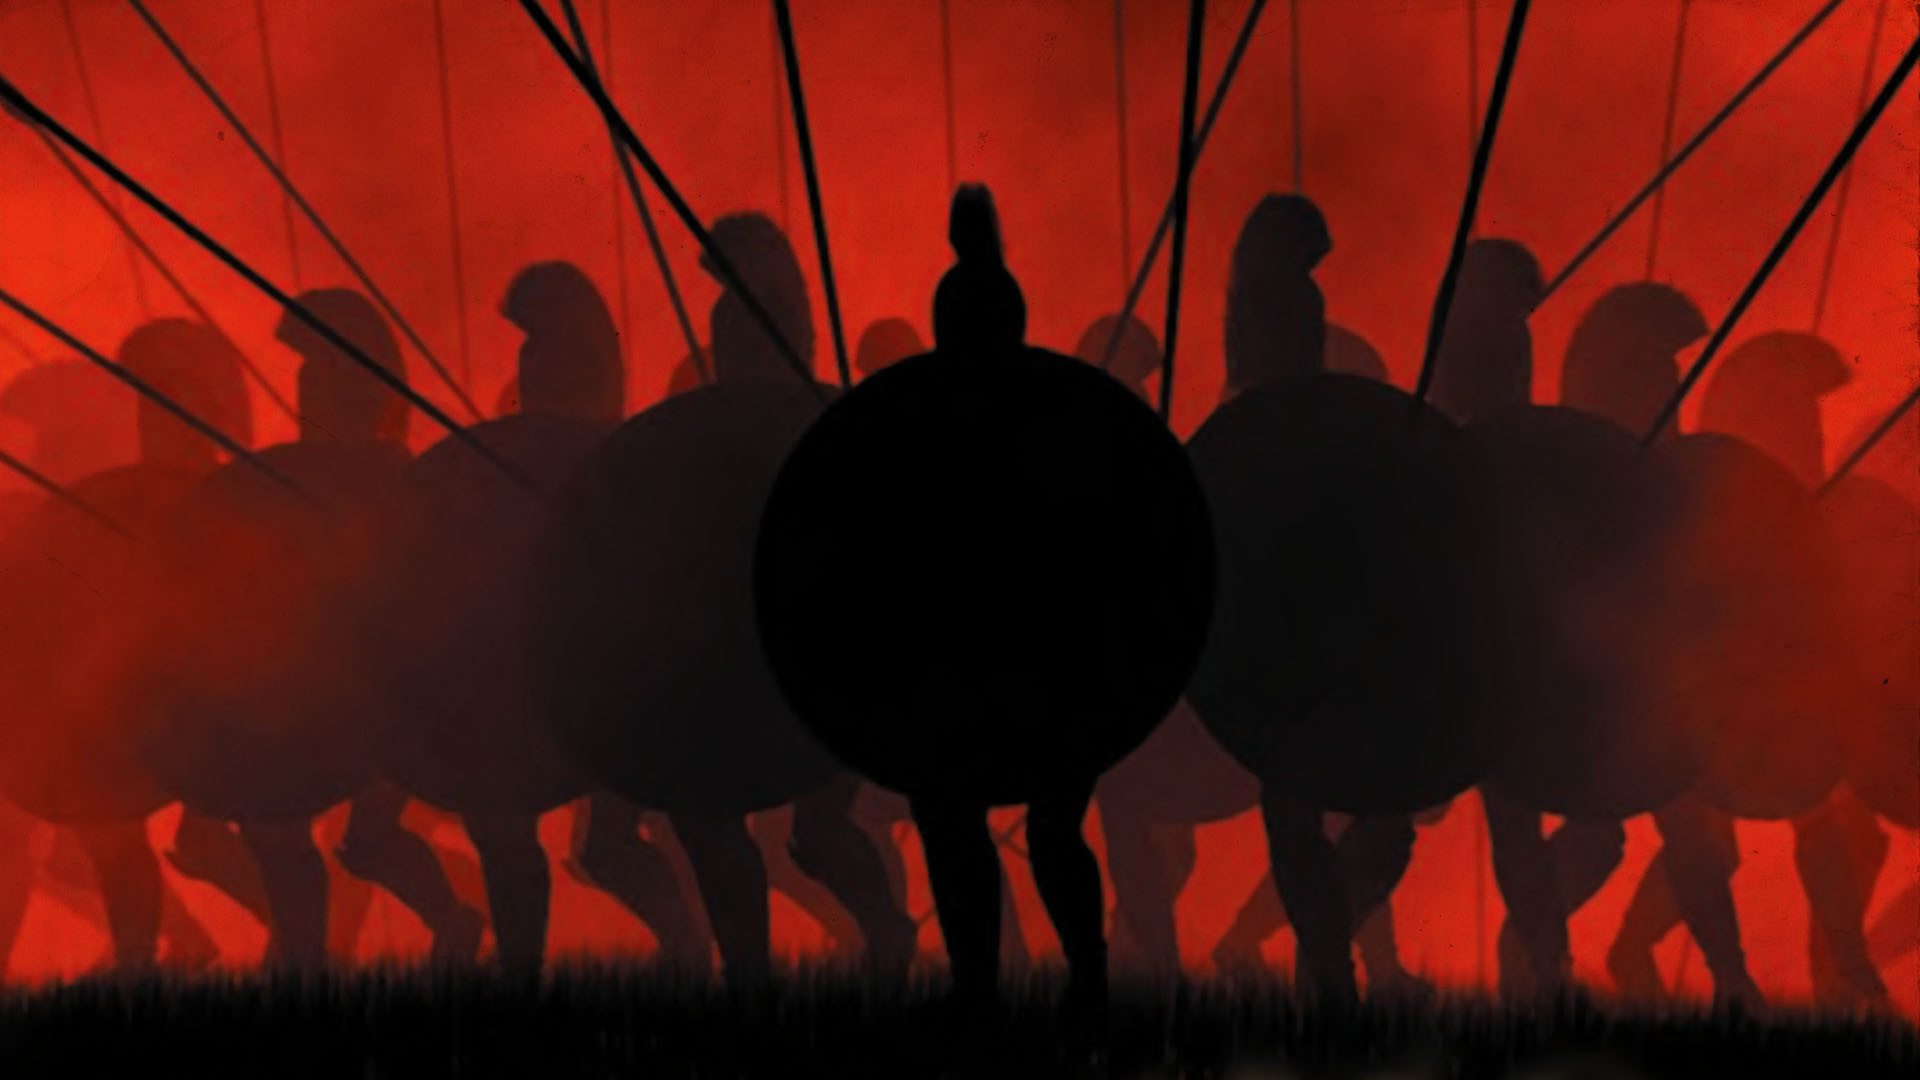 Total War: Rome wallpapers or desktop backgrounds Rome Total War Wallpapers